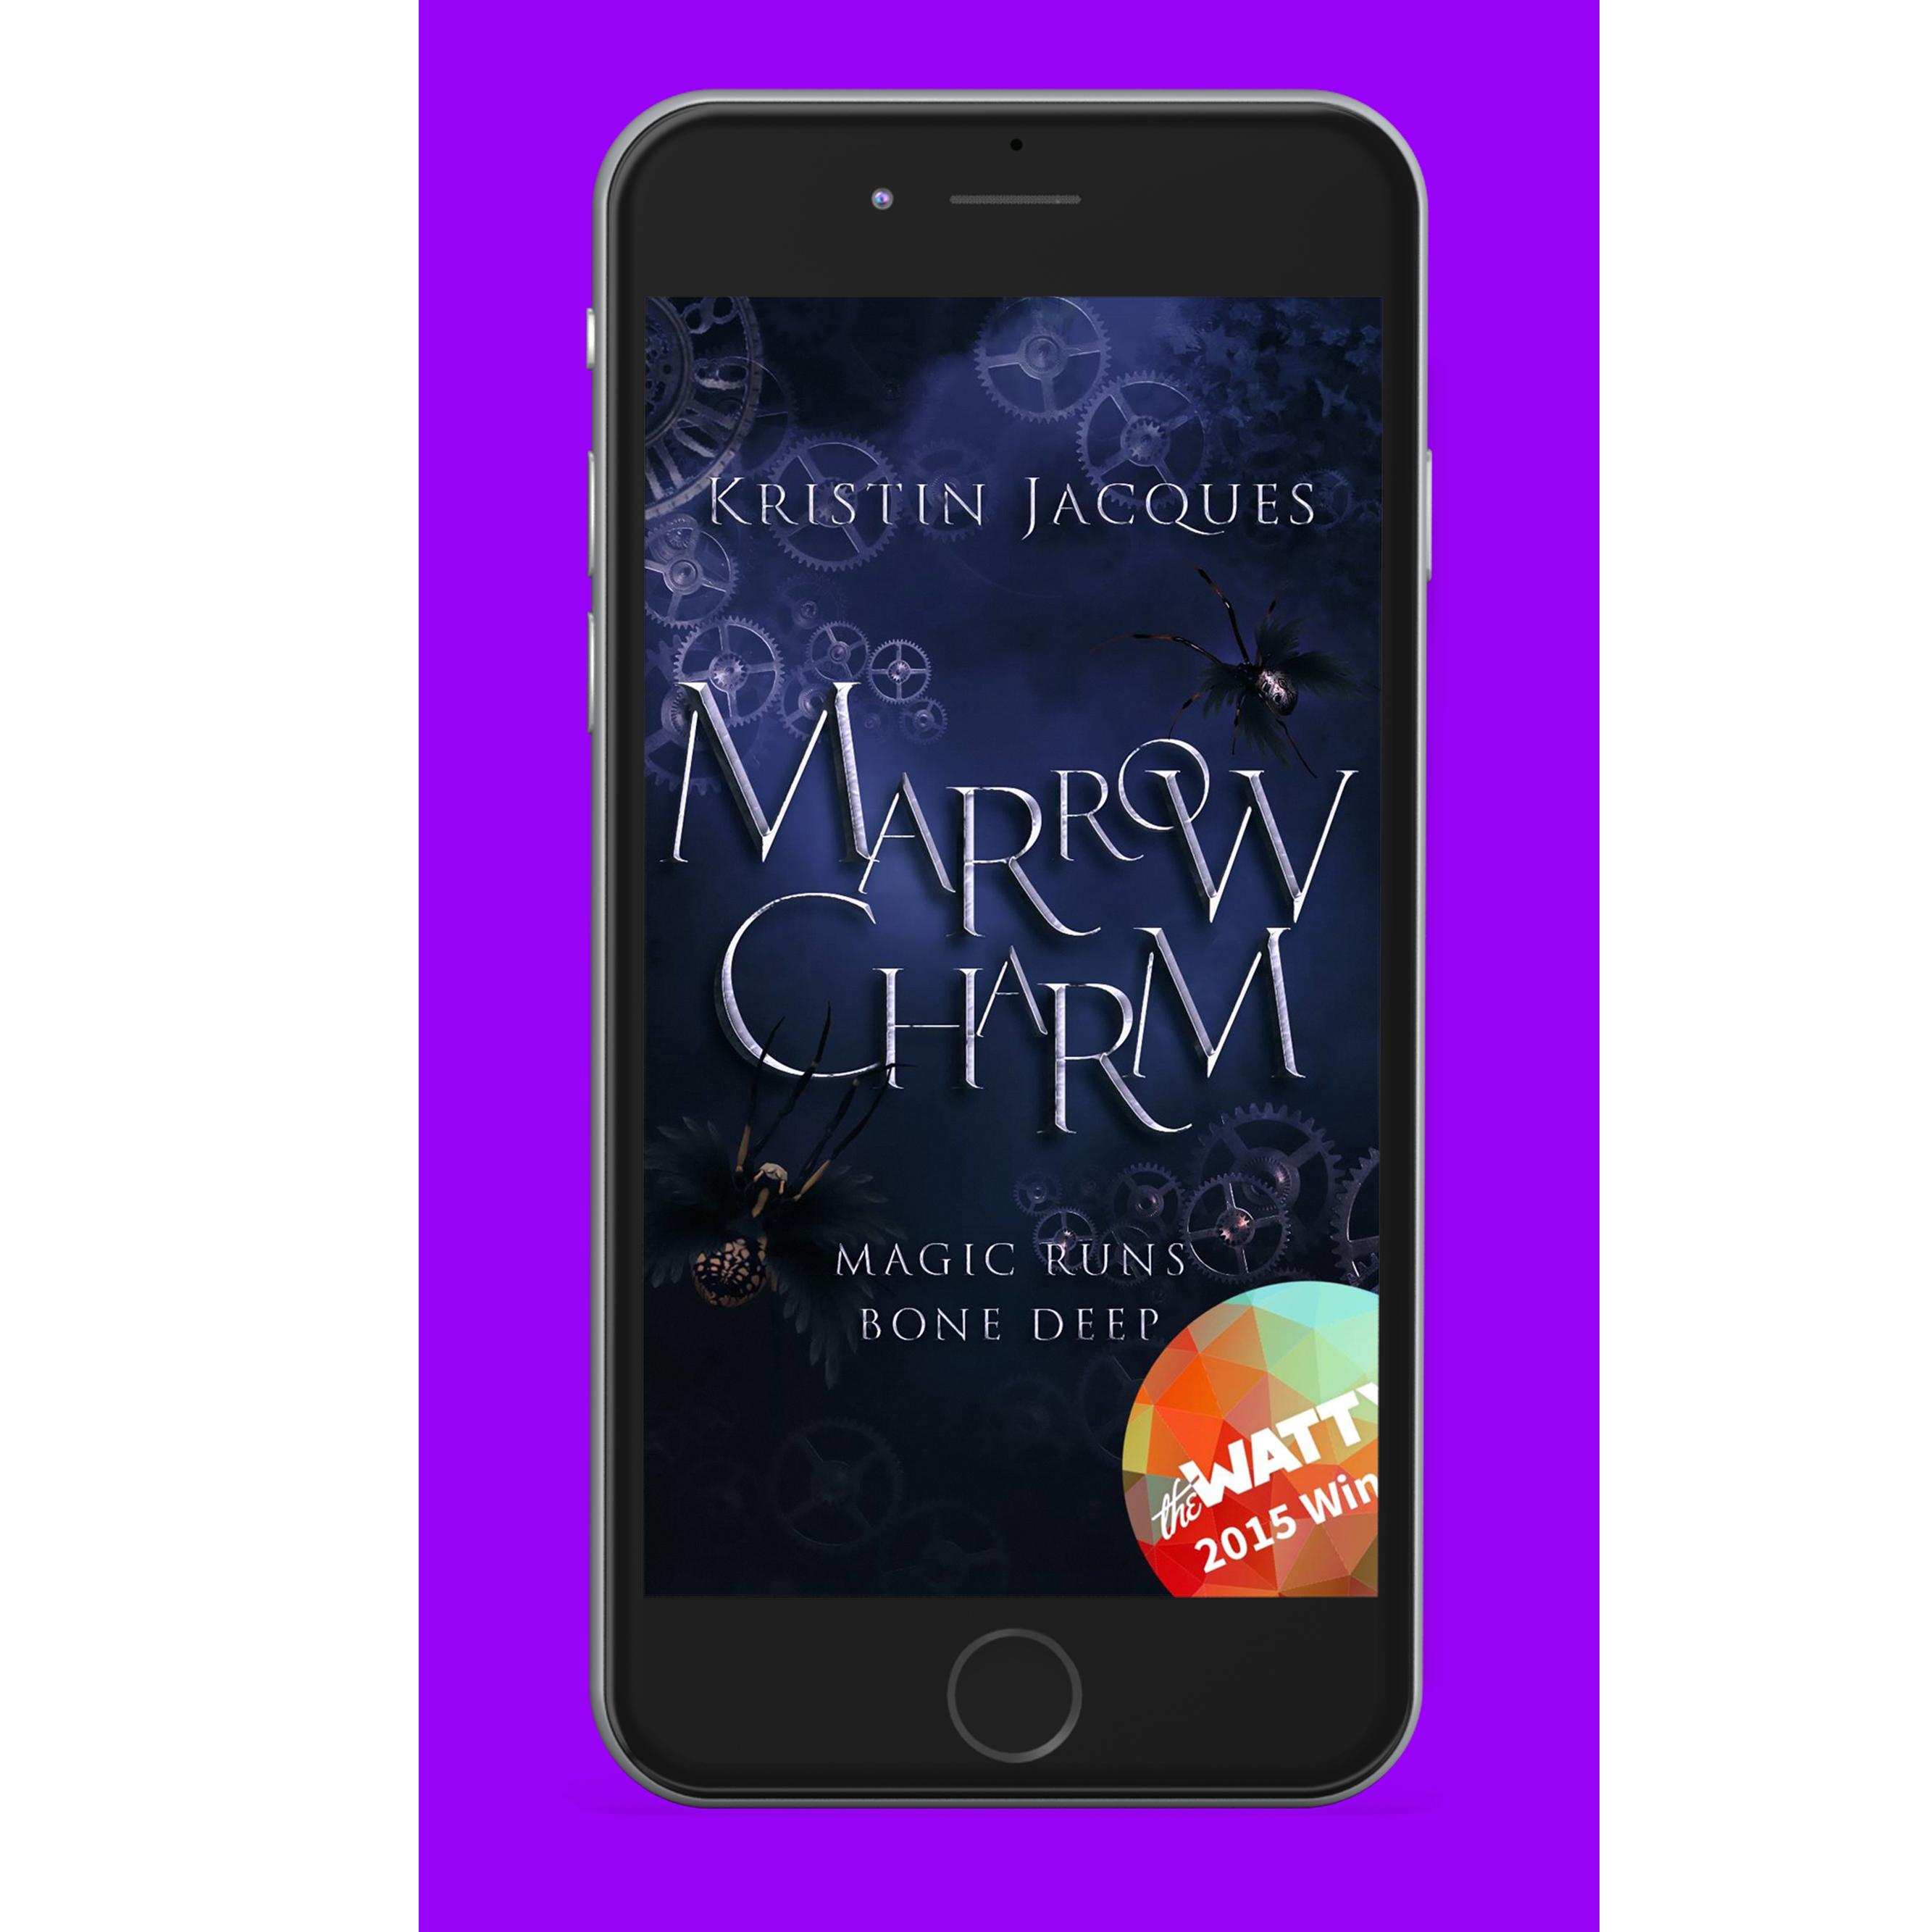 Read Marrow Charm by Kristin Jacques | www.kristinjacques.com